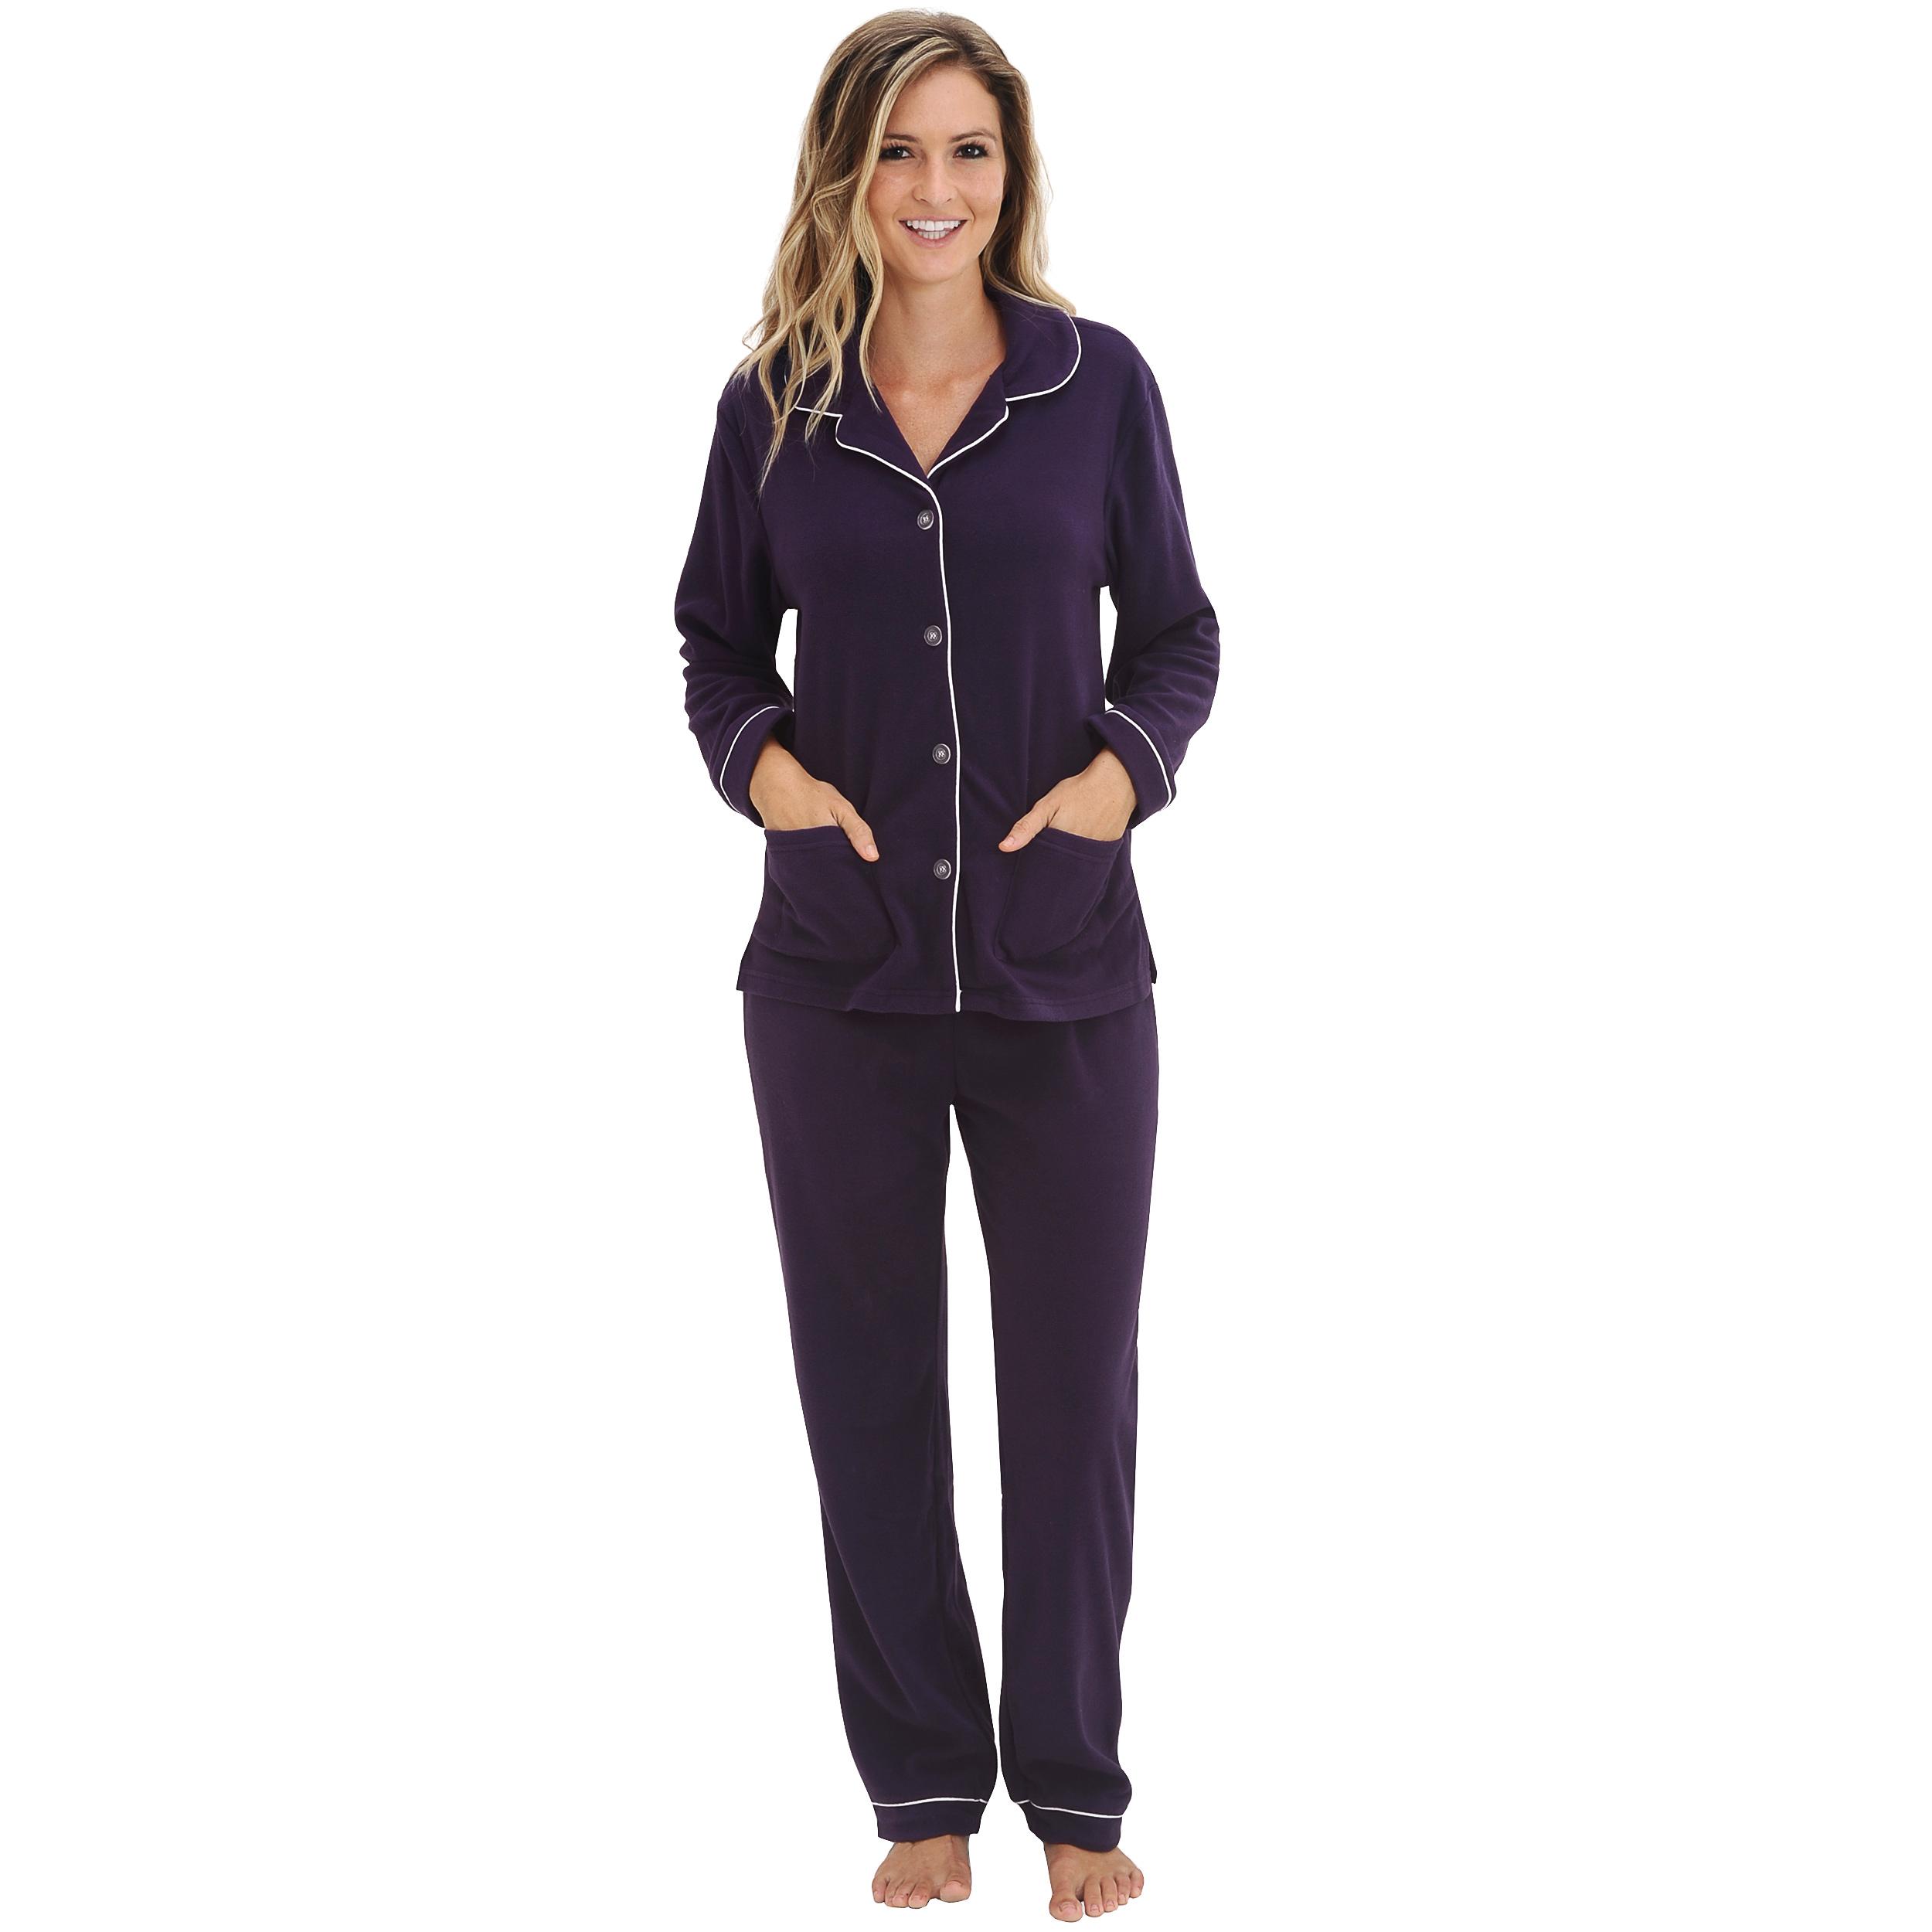 Women's Pajama Set | Polar Fleece Two Piece Pajamas | Del Rossa